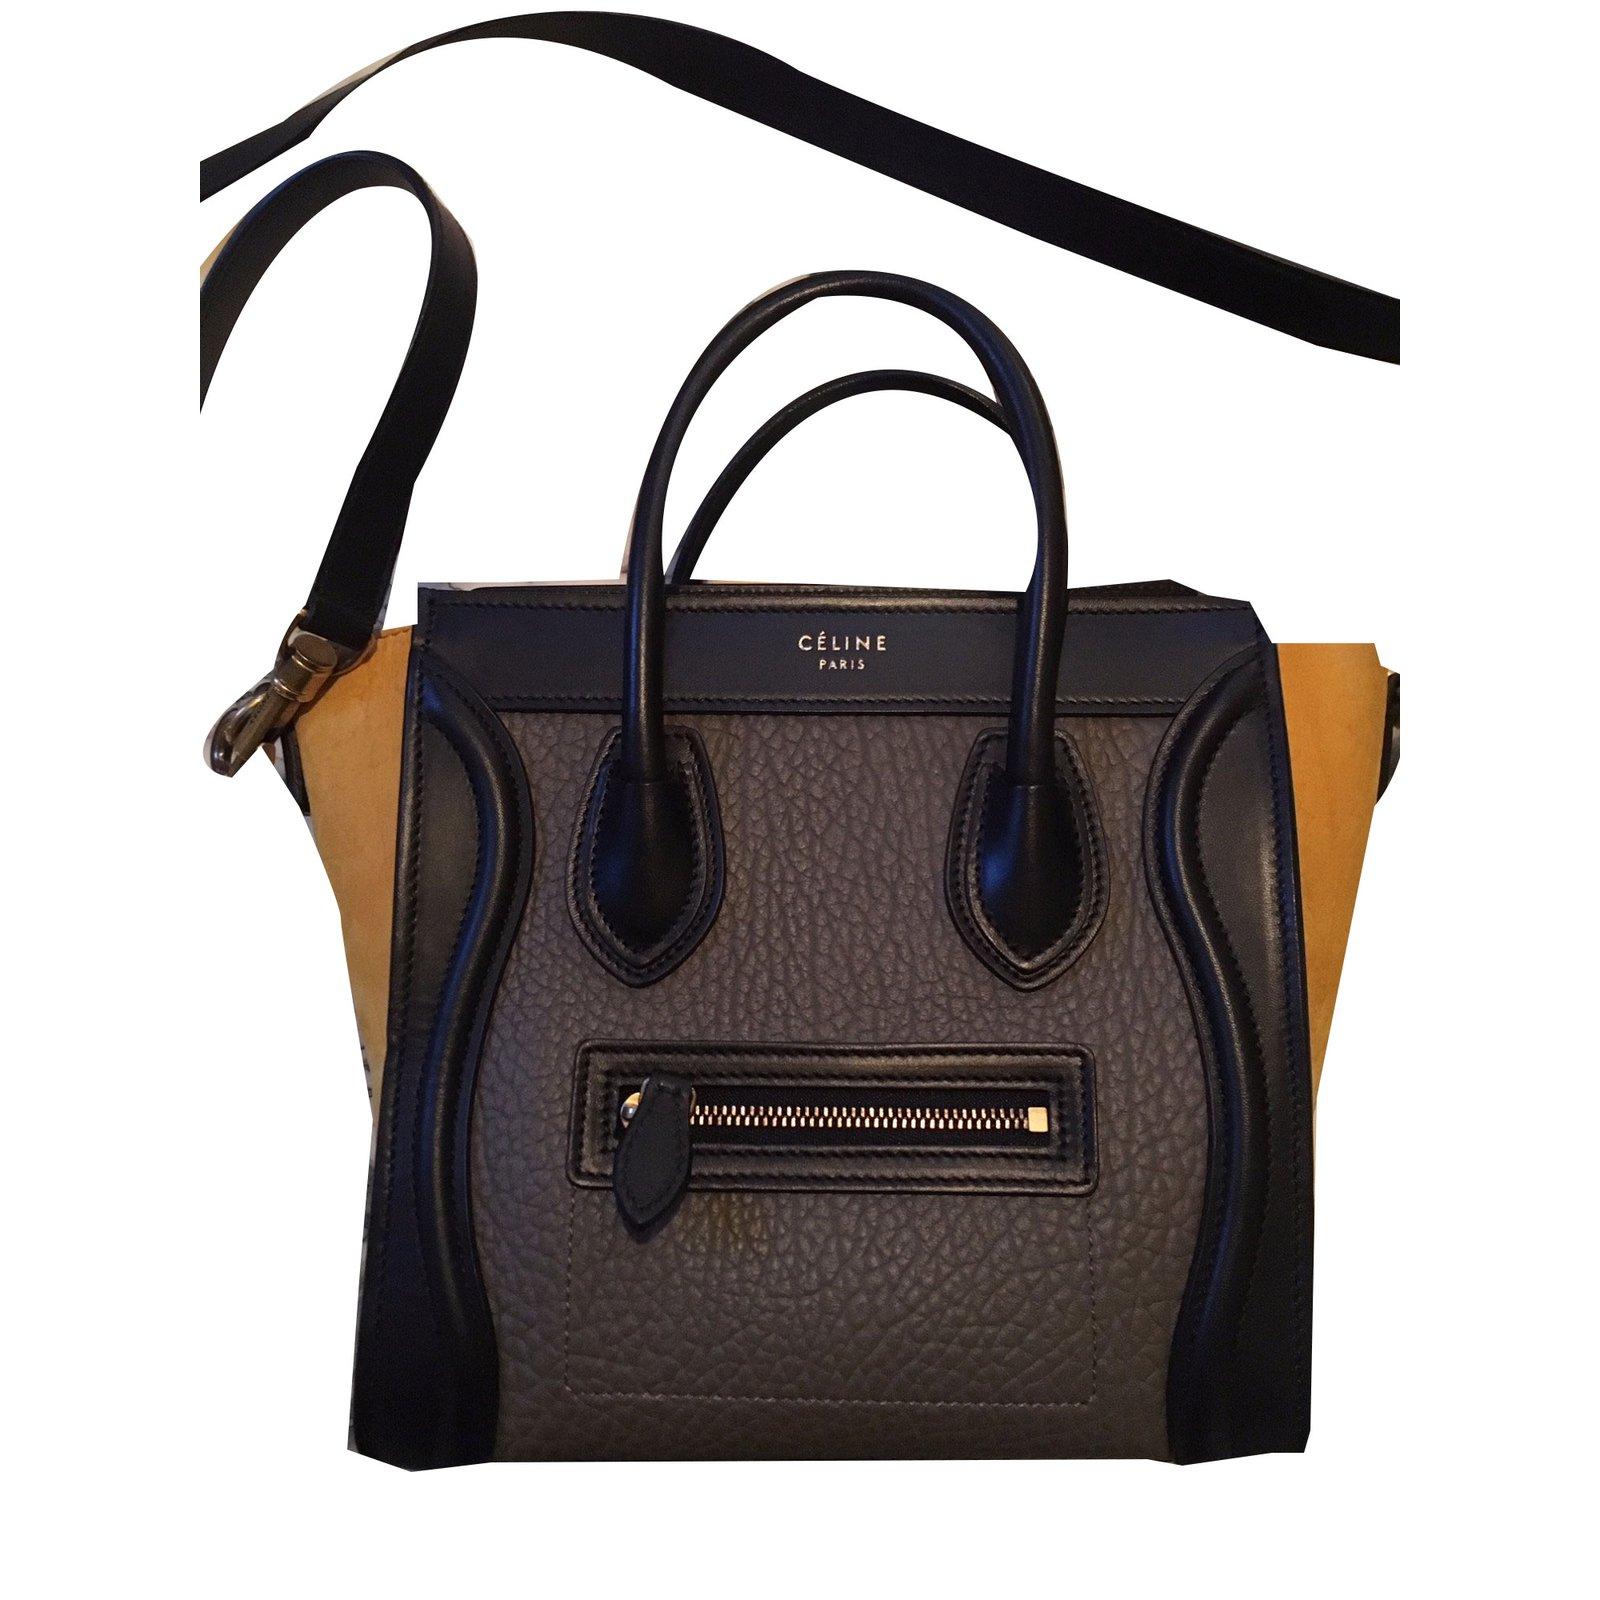 Céline Nano Luge Handbags Leather Grey Ref 53739